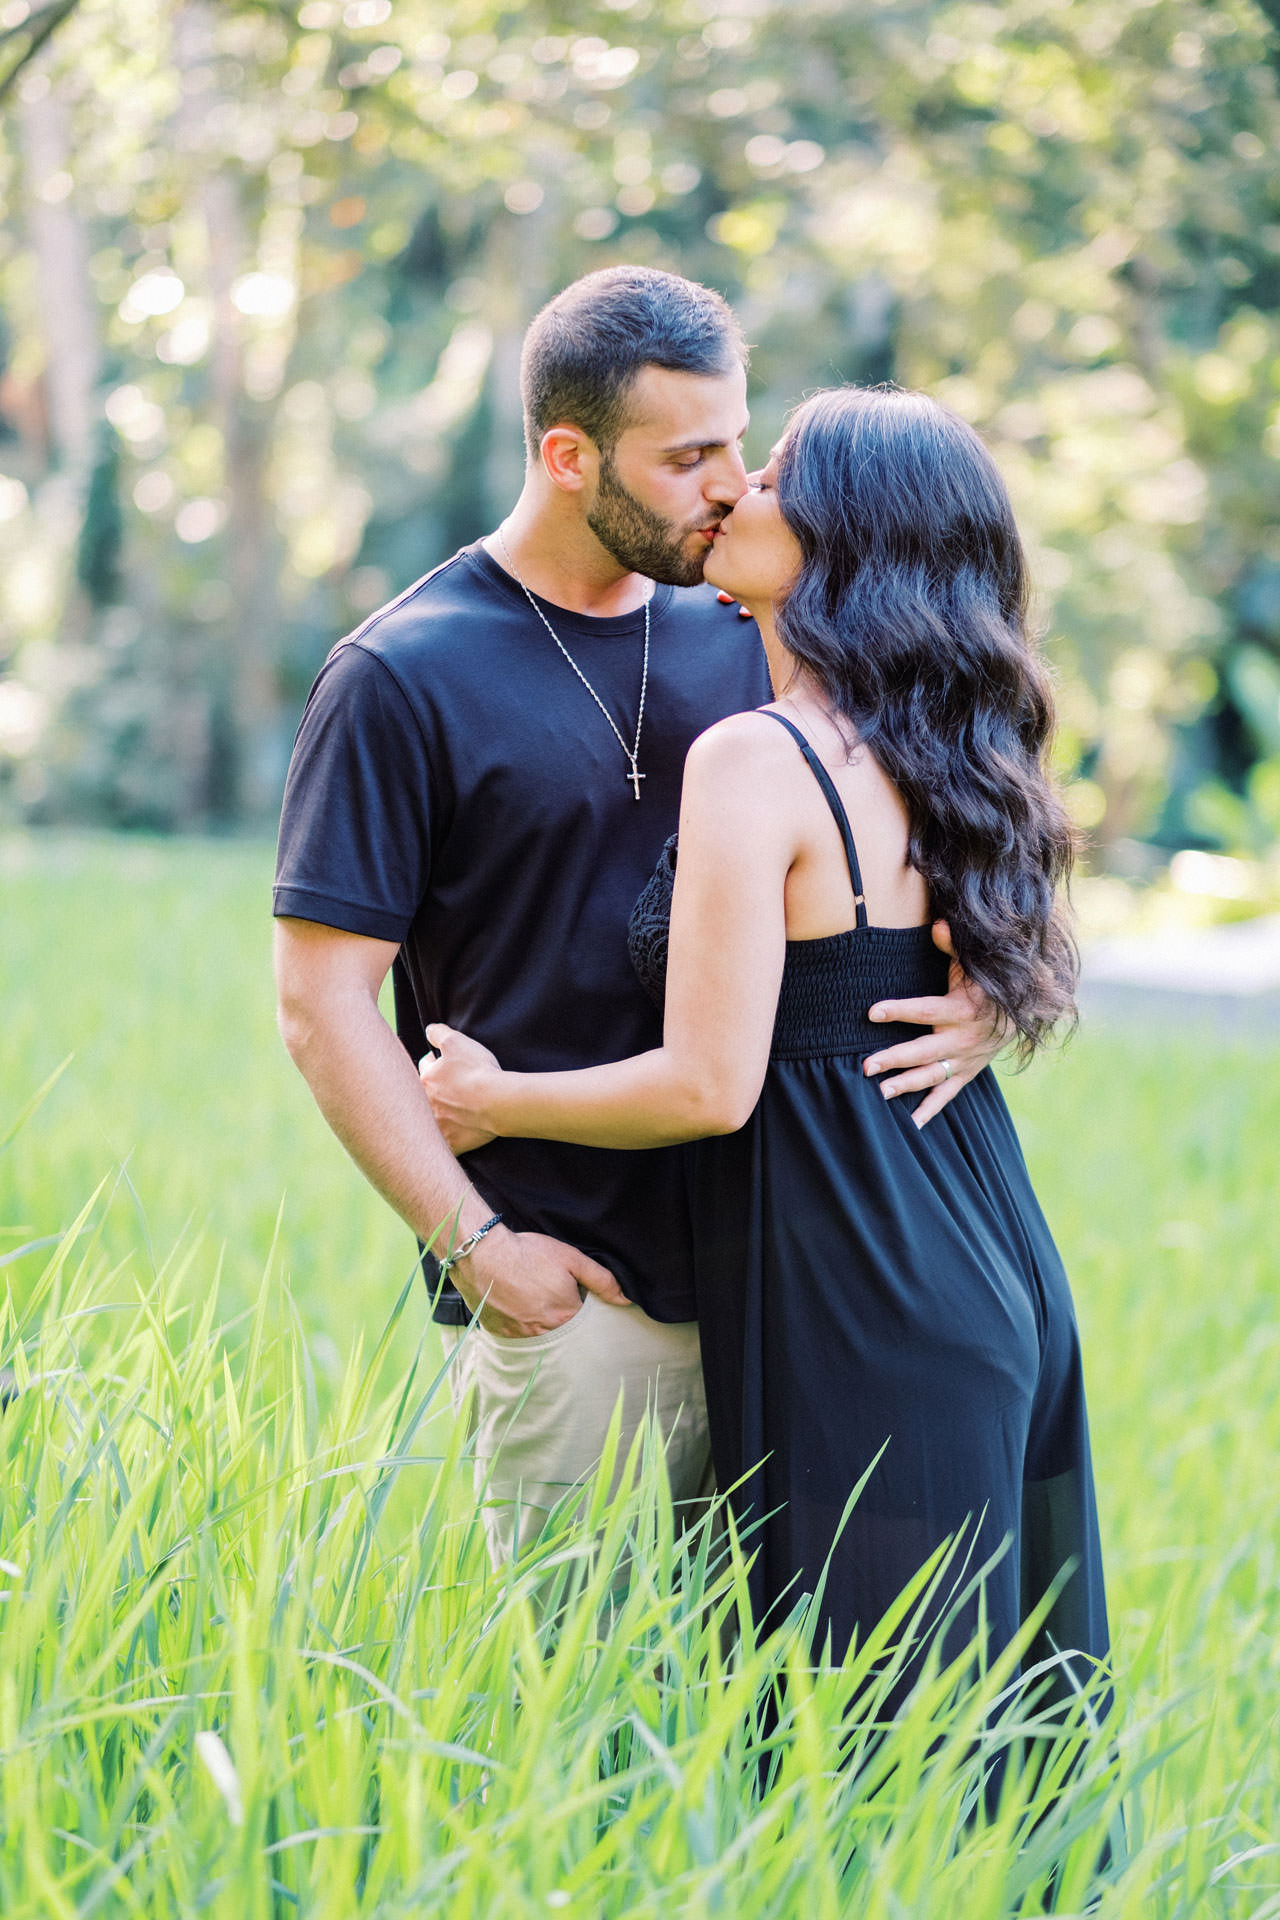 Honeymoon Photo Session at The World's Best Resort 8